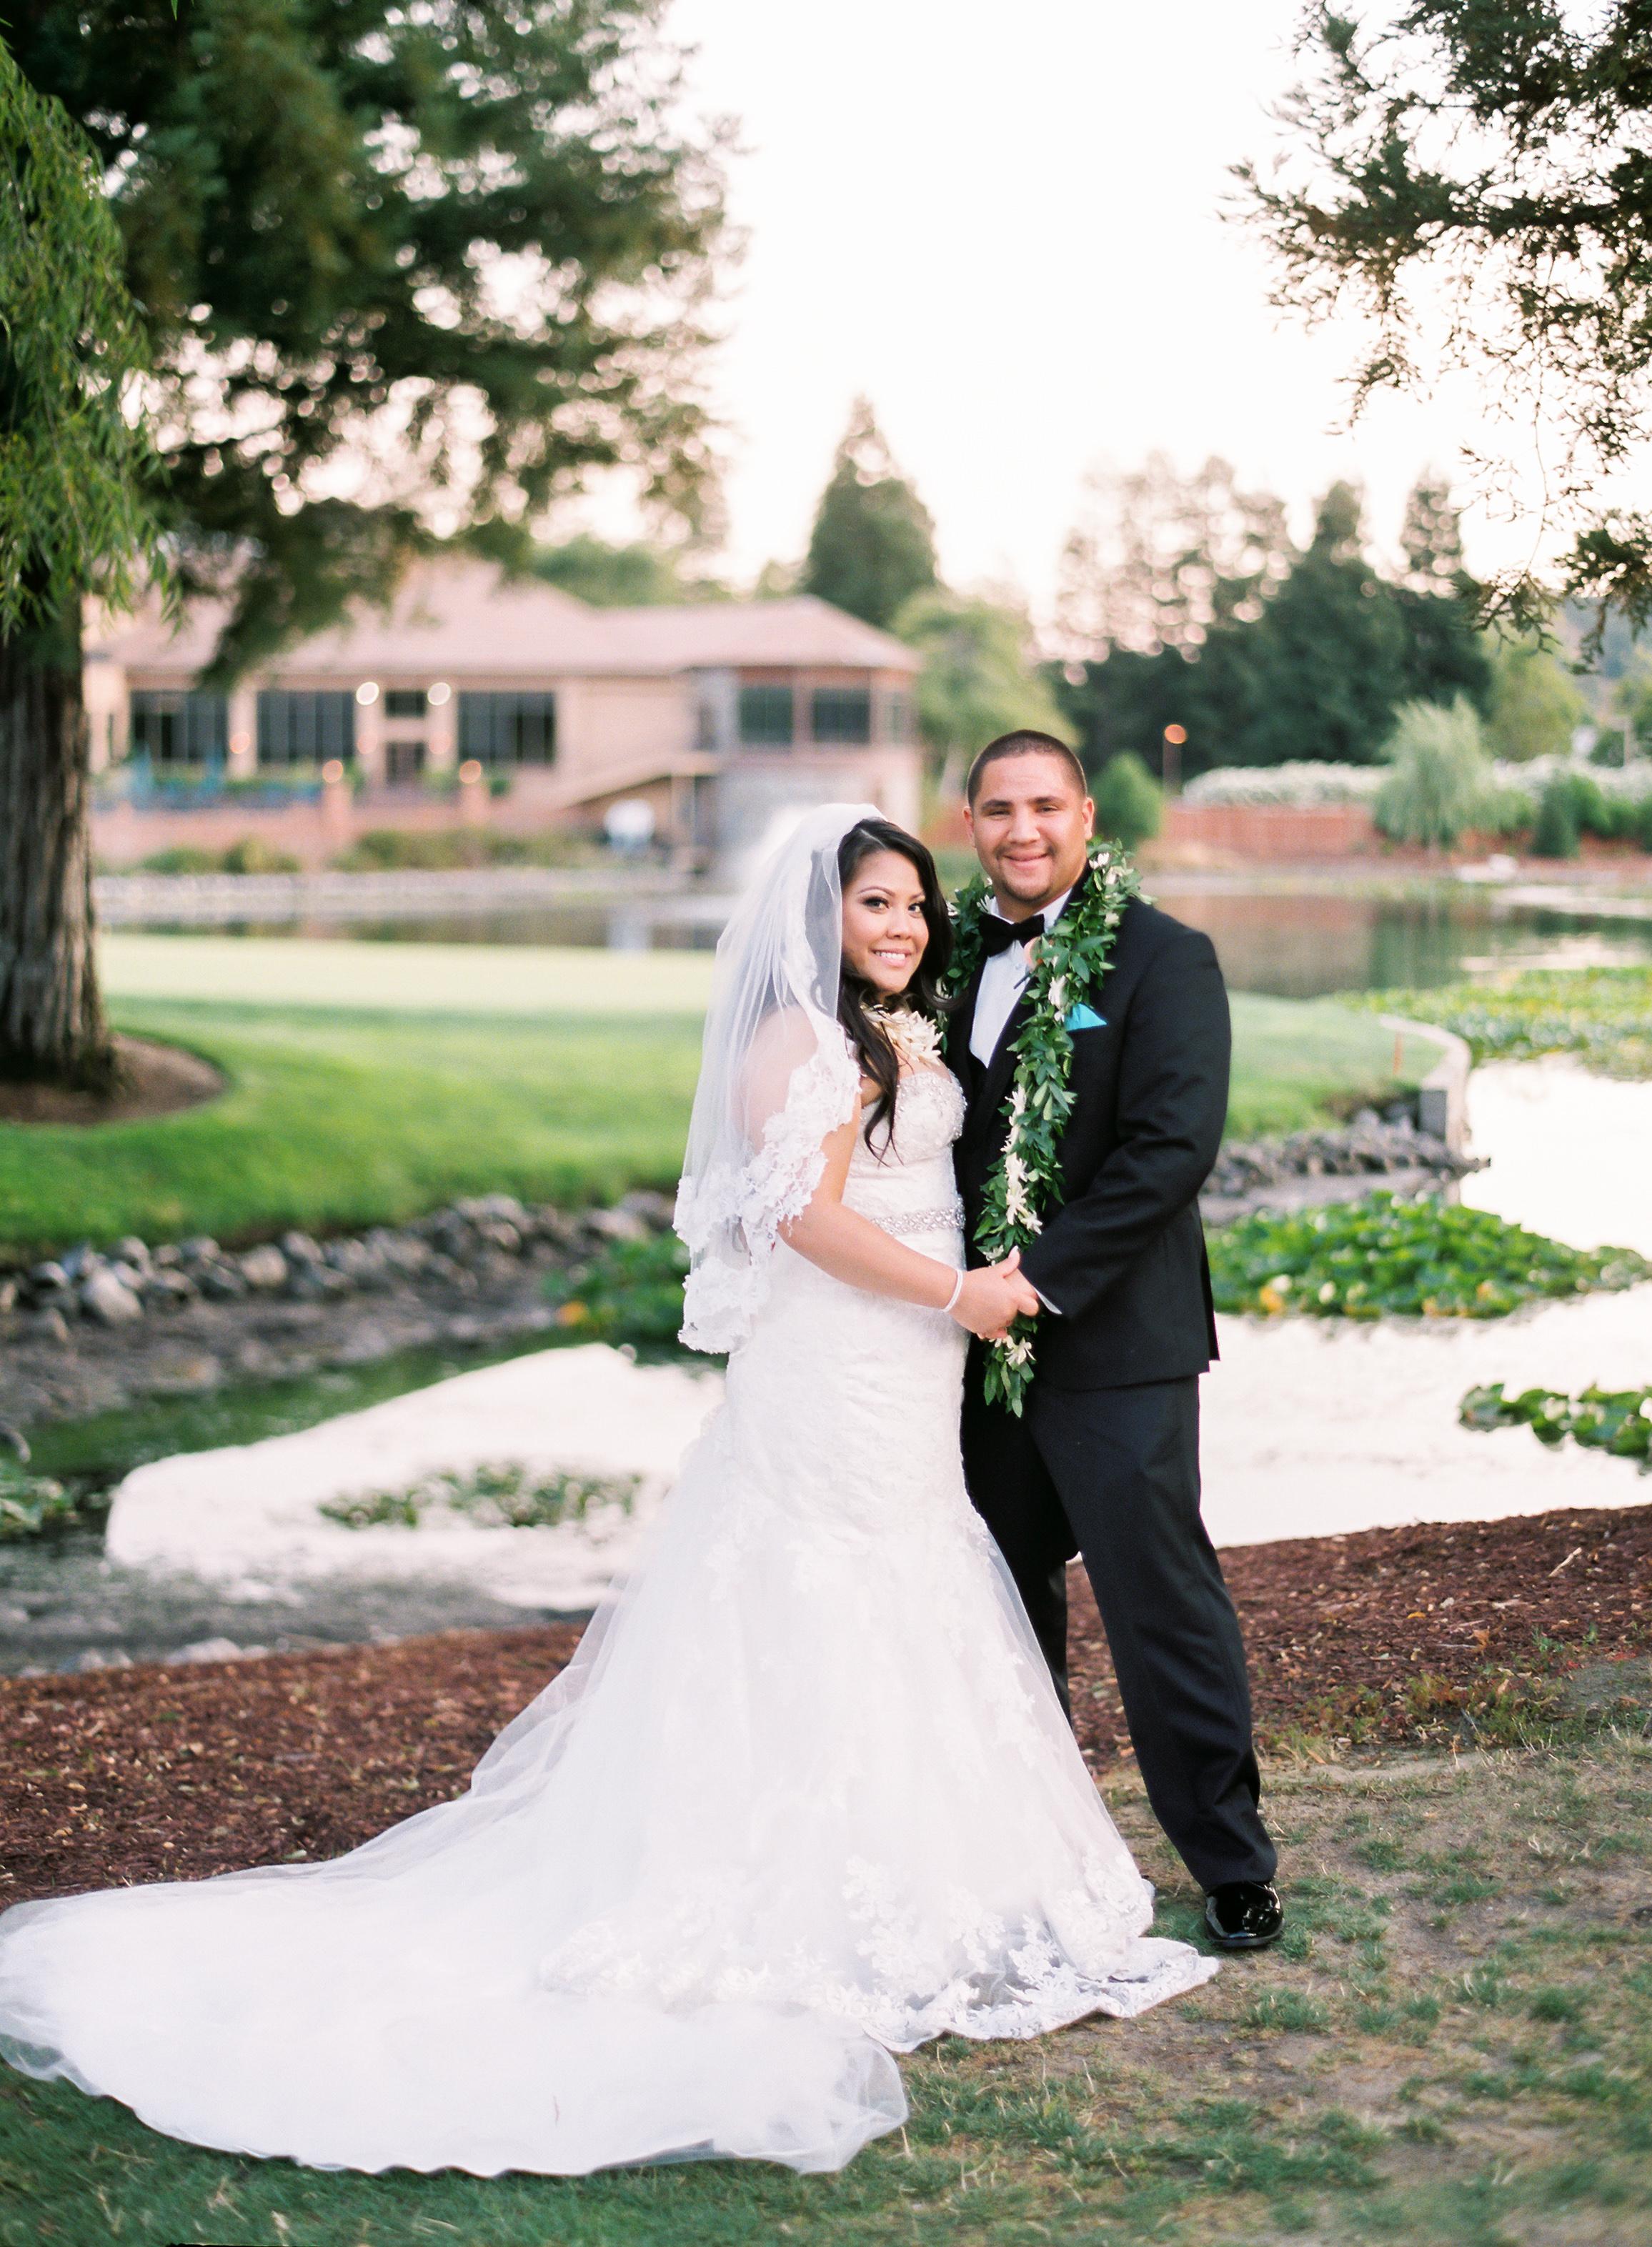 hawaiian-inspired-wedding-at-blackhawk-country-club-012.jpg